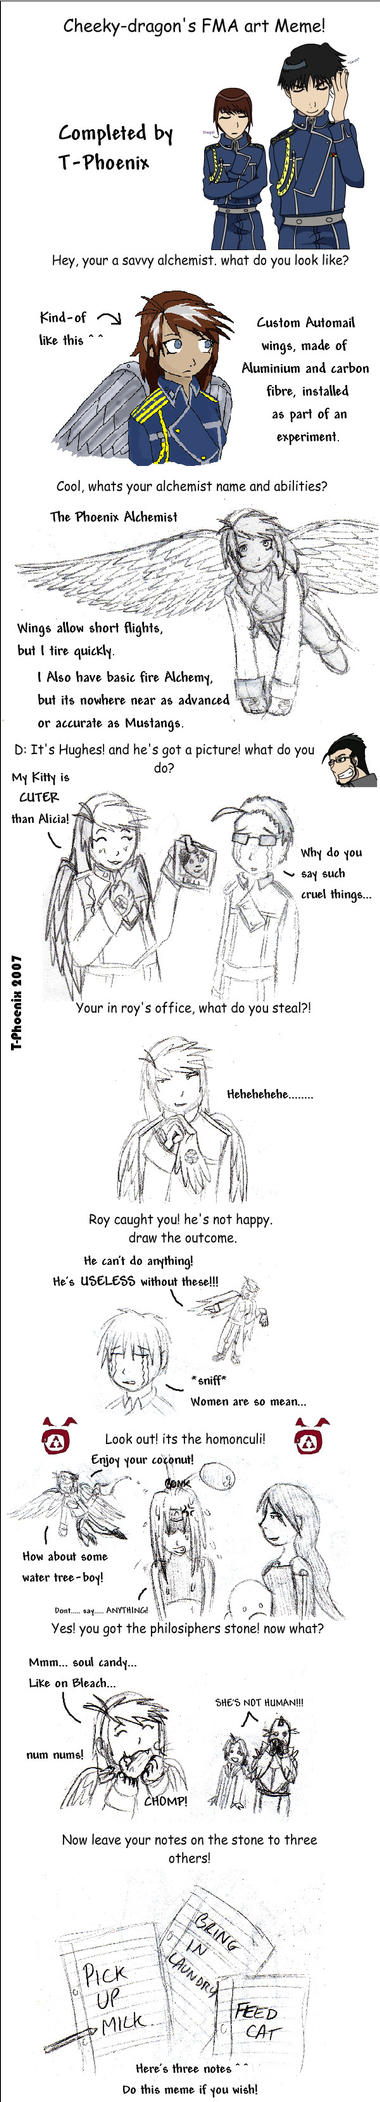 FMA Meme by Heliotrope-Housecat